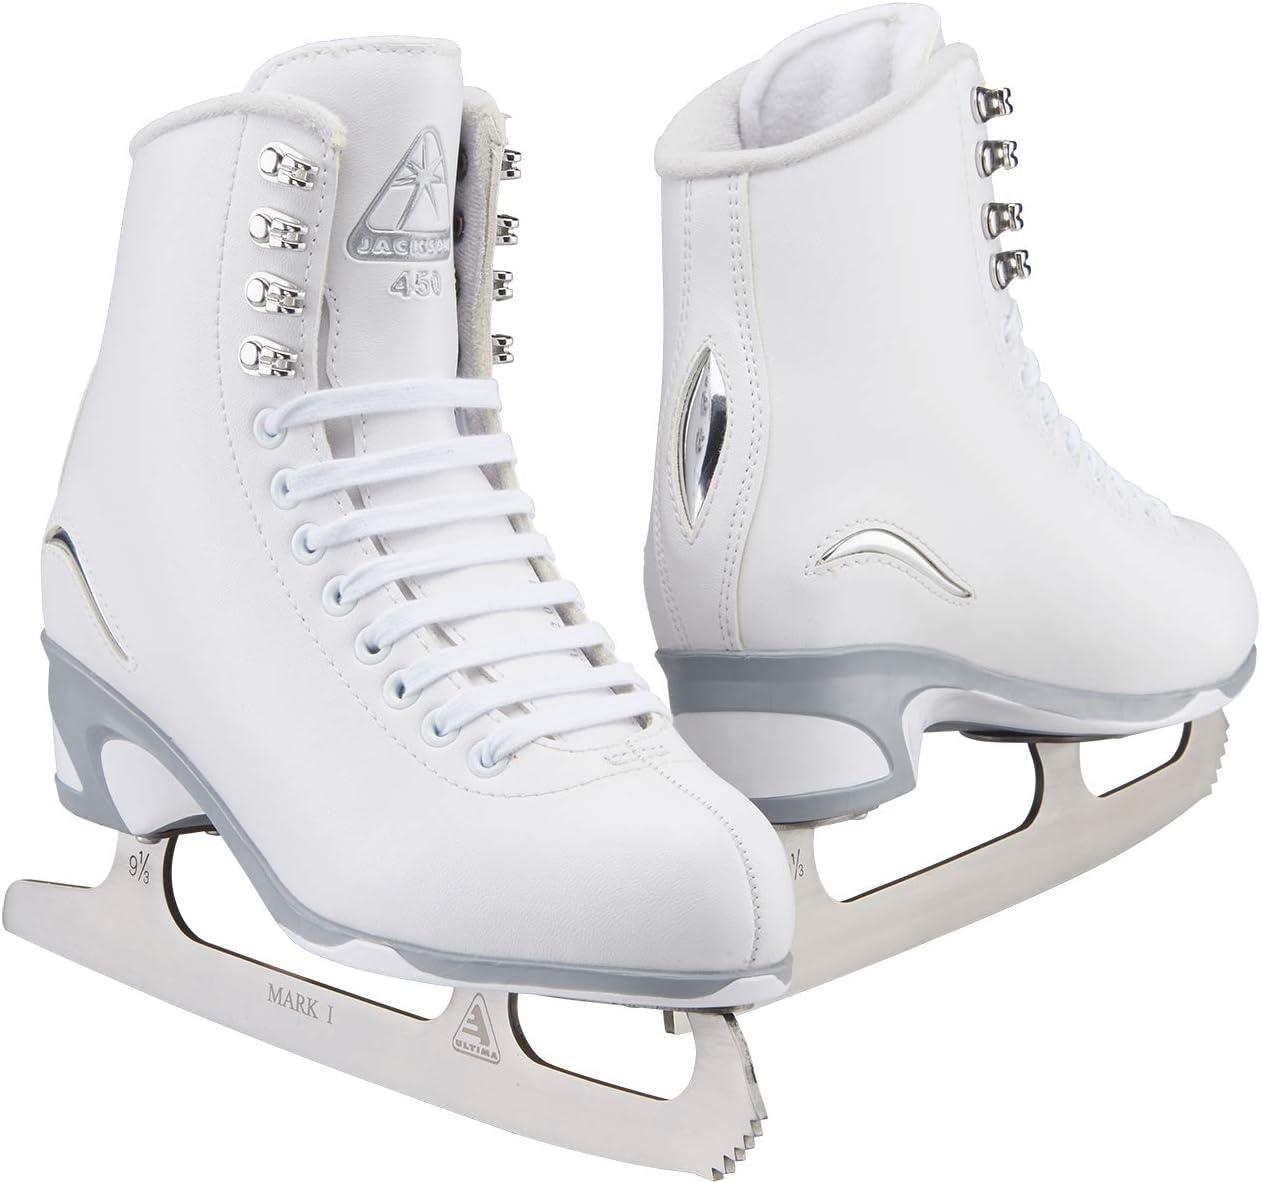 Jackson Ultima Finesse Women's/Girls Figure Ice Skates - Children's Size 11